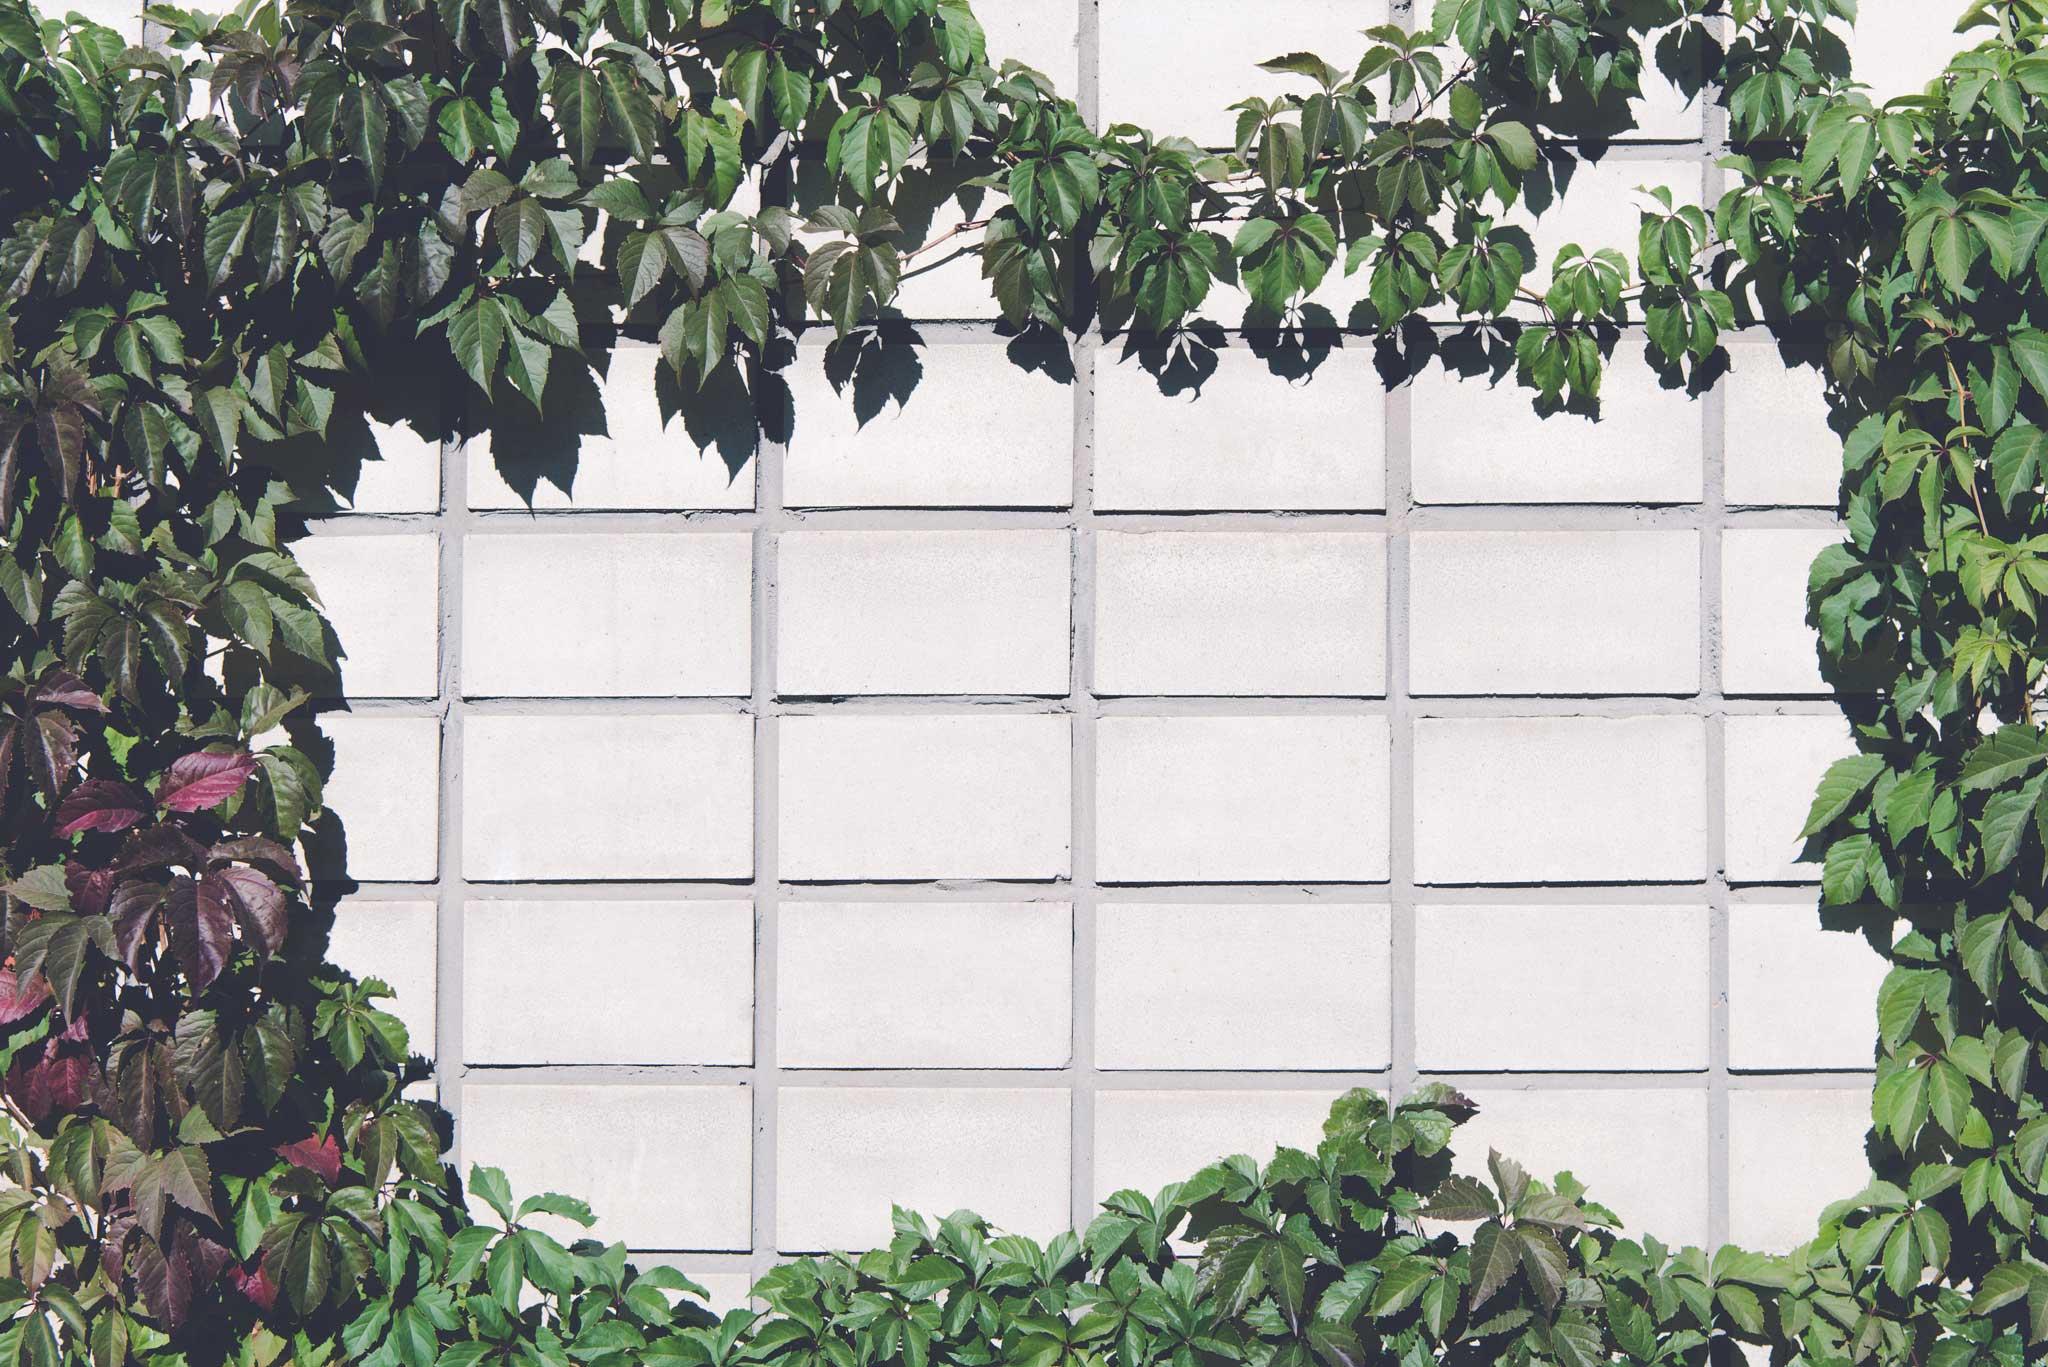 tapet-fototapet-design-decor-mural-customizabil-comanda-personalizat-bucuresti-daring-prints-motiv-model-vegetal-frunze-iedera-perete-beton